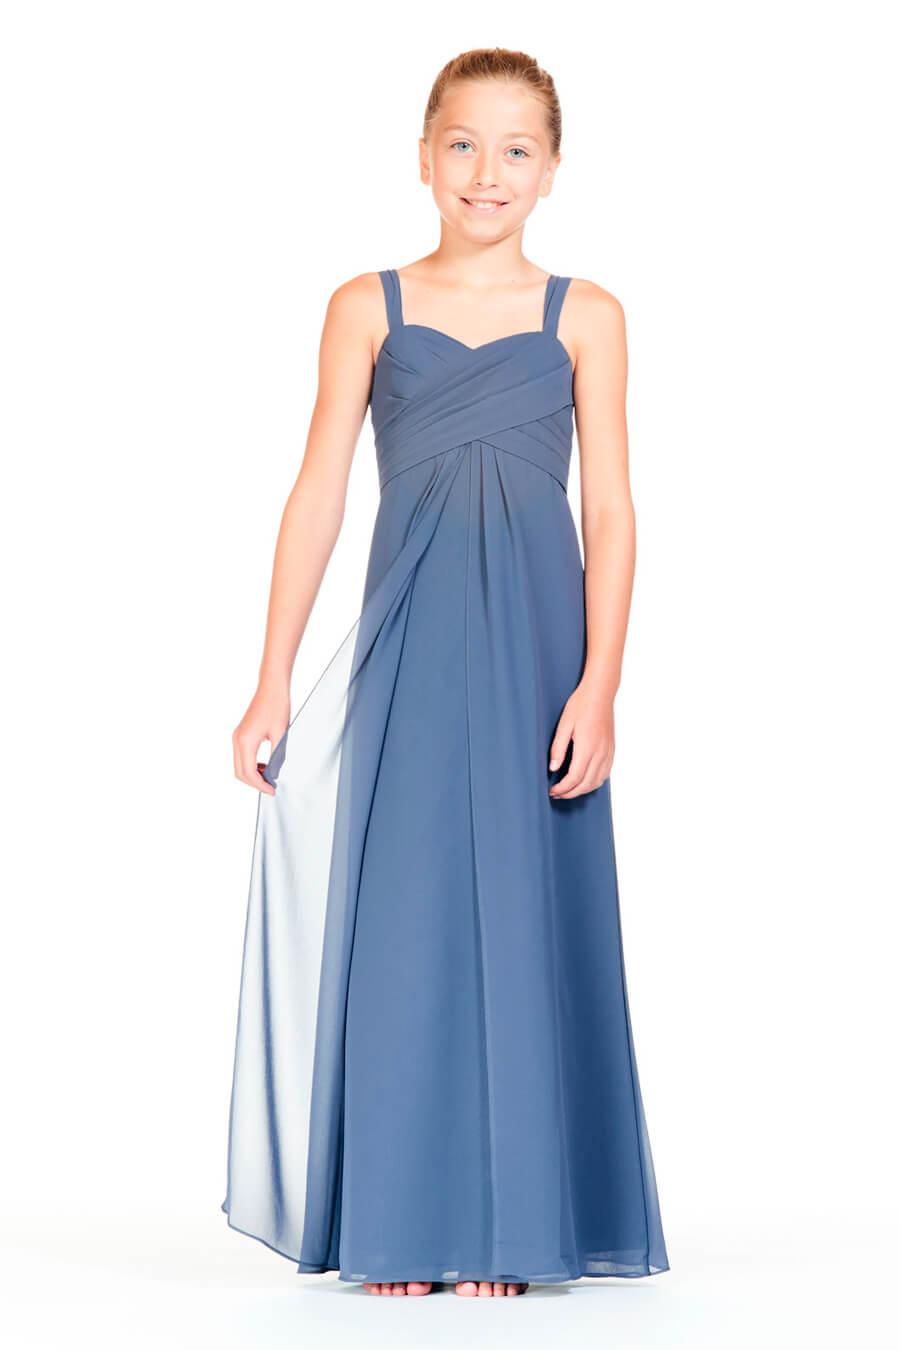 Bari jay bridesmaids bridesmaid dresses prom dresses formal bari jay bridesmaids bridesmaid dresses prom dresses formal gowns bari jay and shimmer ombrellifo Gallery